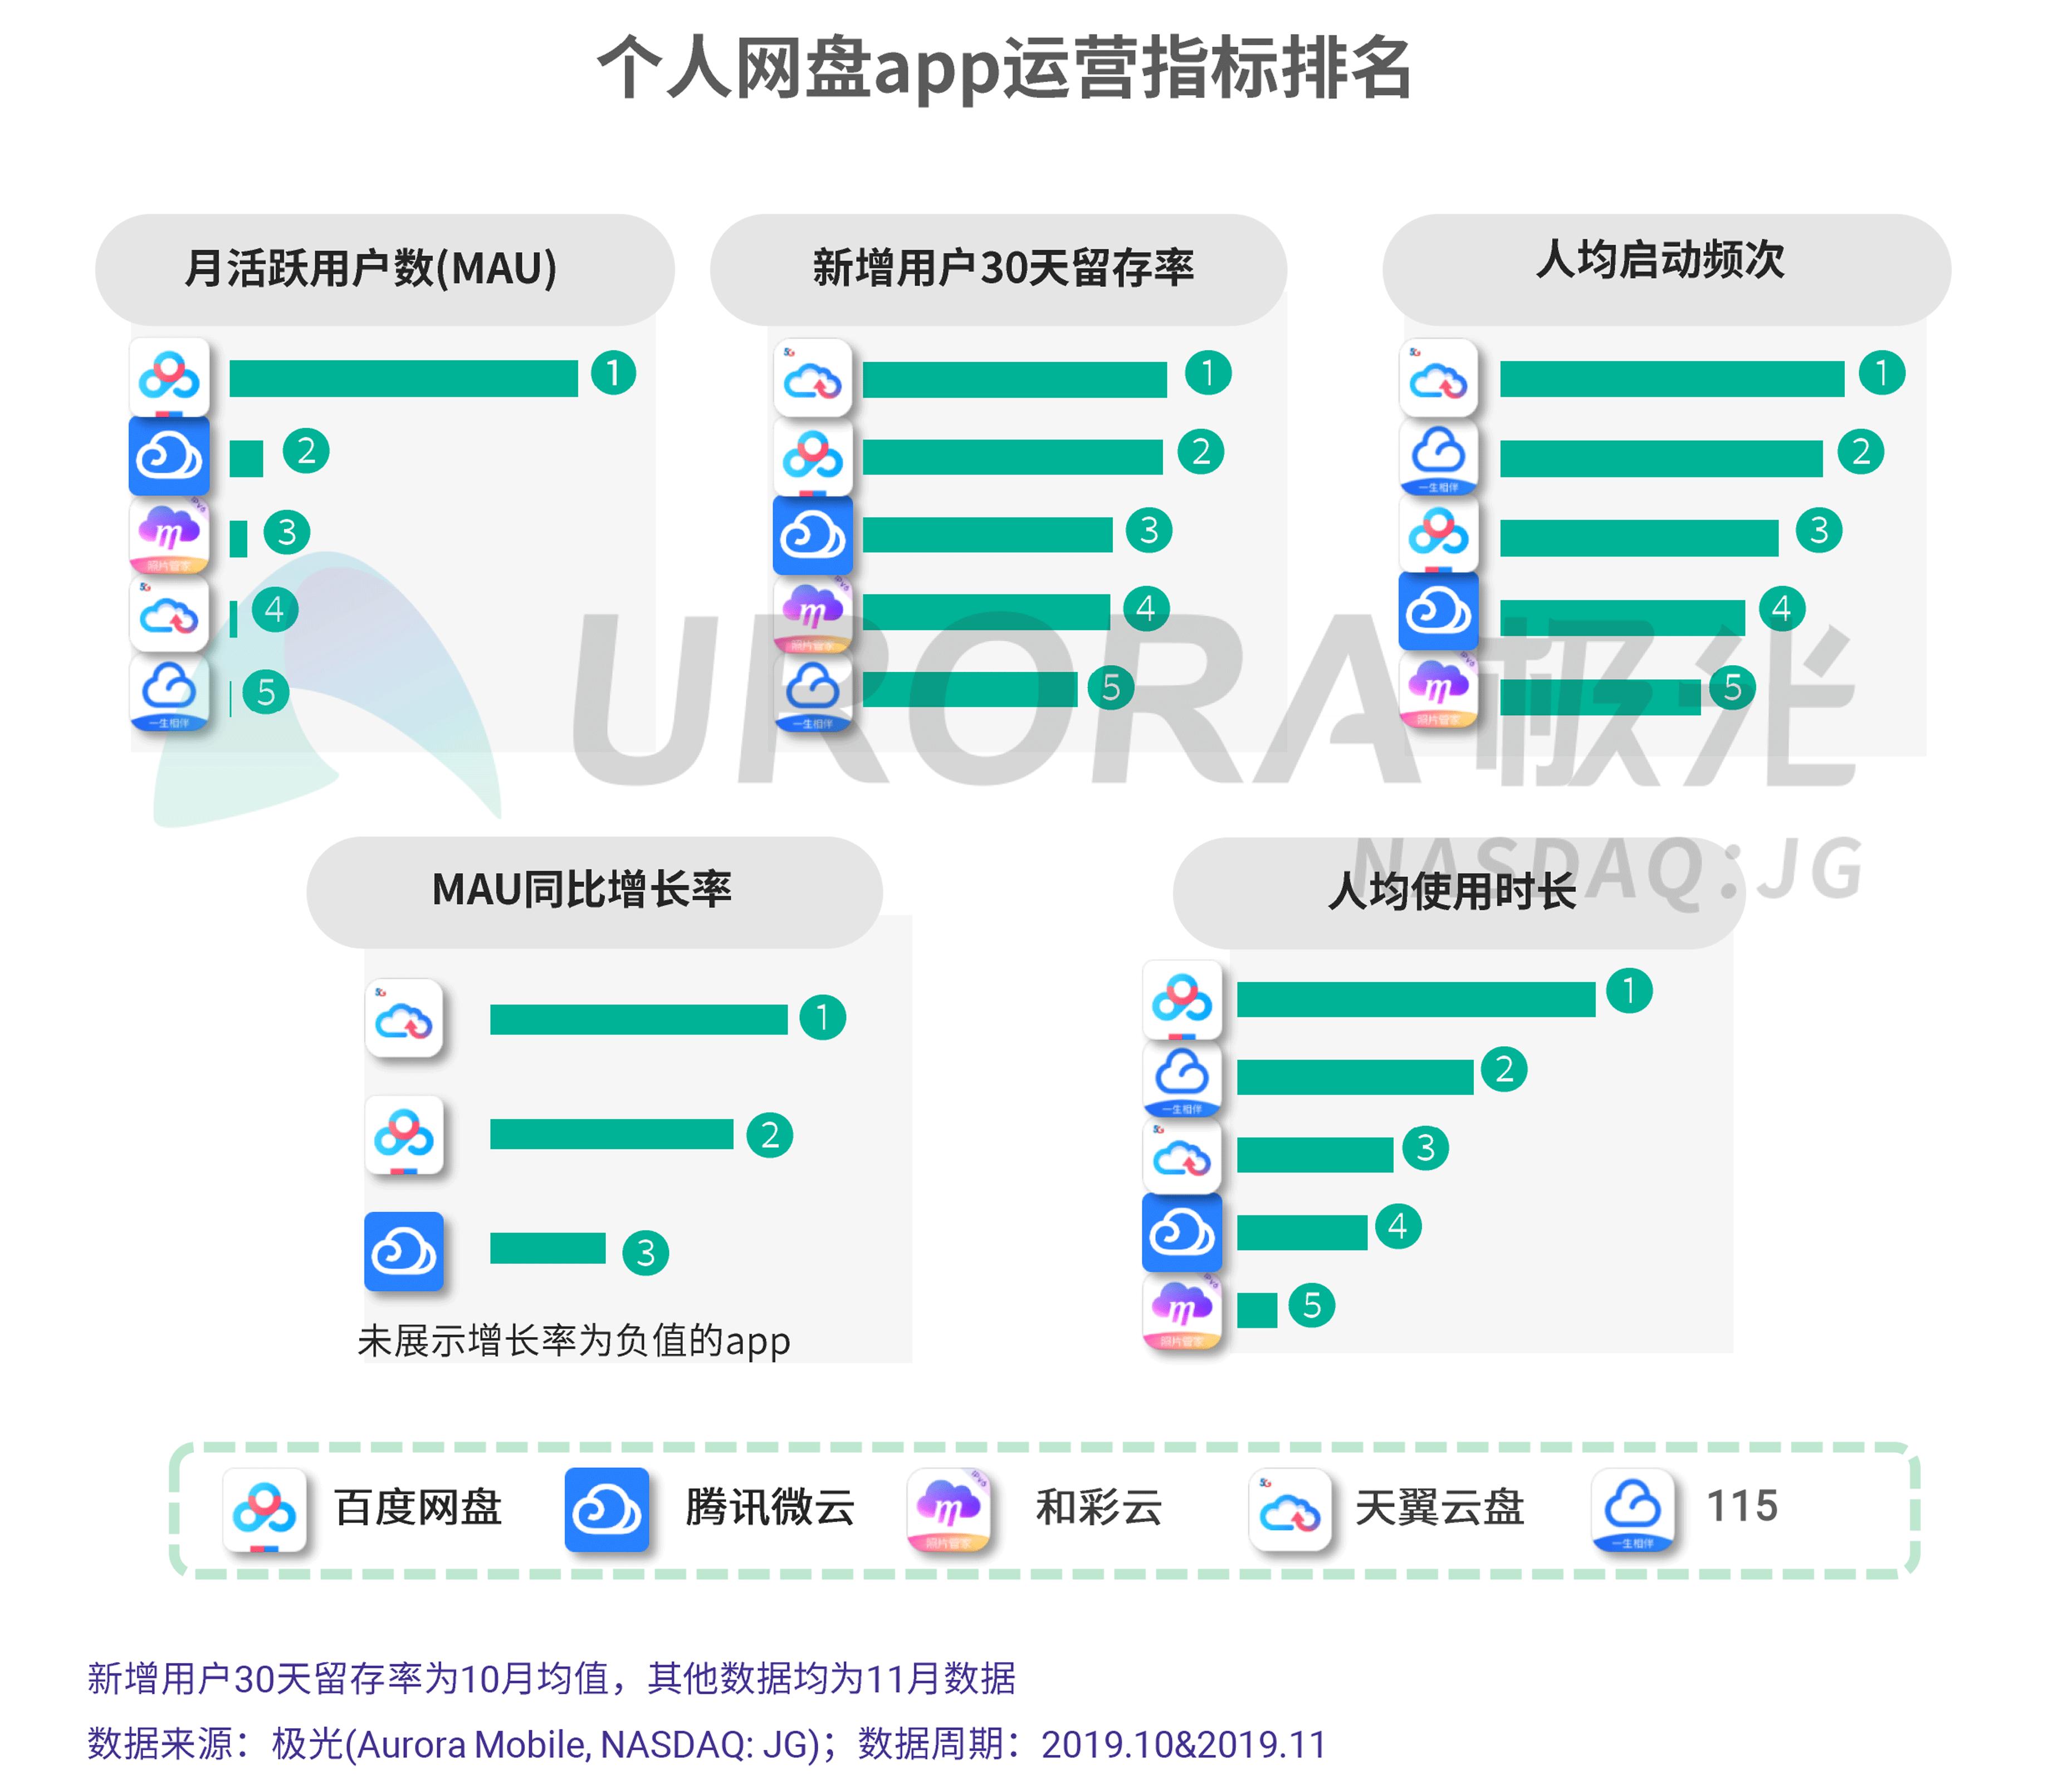 JIGUANG-个人网盘行业研究报告-final---切图版2-12.png